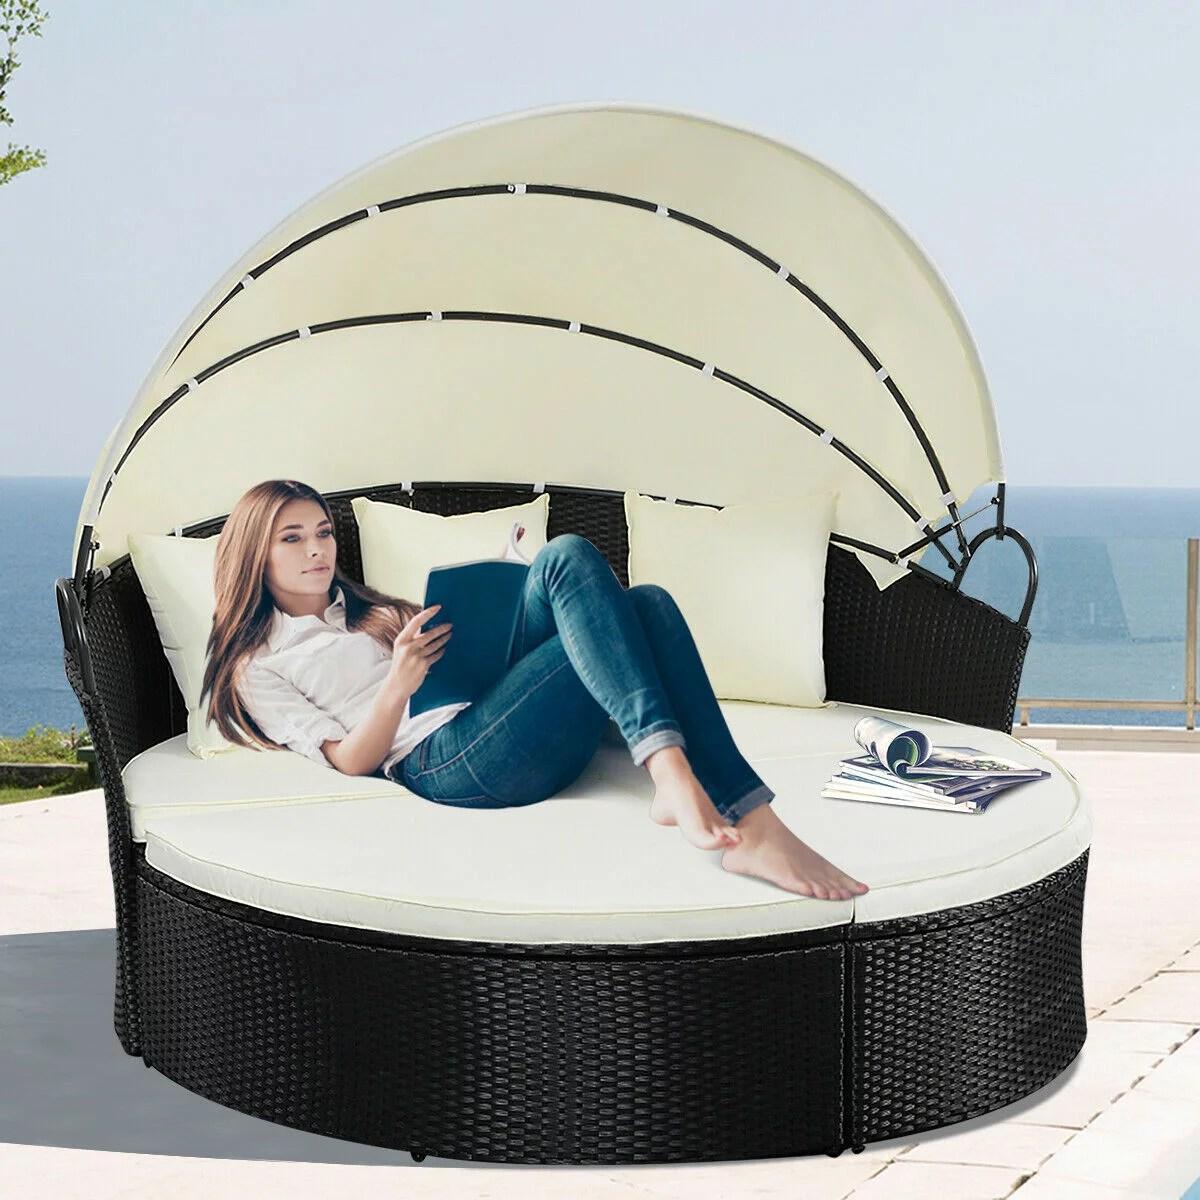 costway outdoor patio sofa furniture round retractable canopy daybed black wicker rattan walmart com